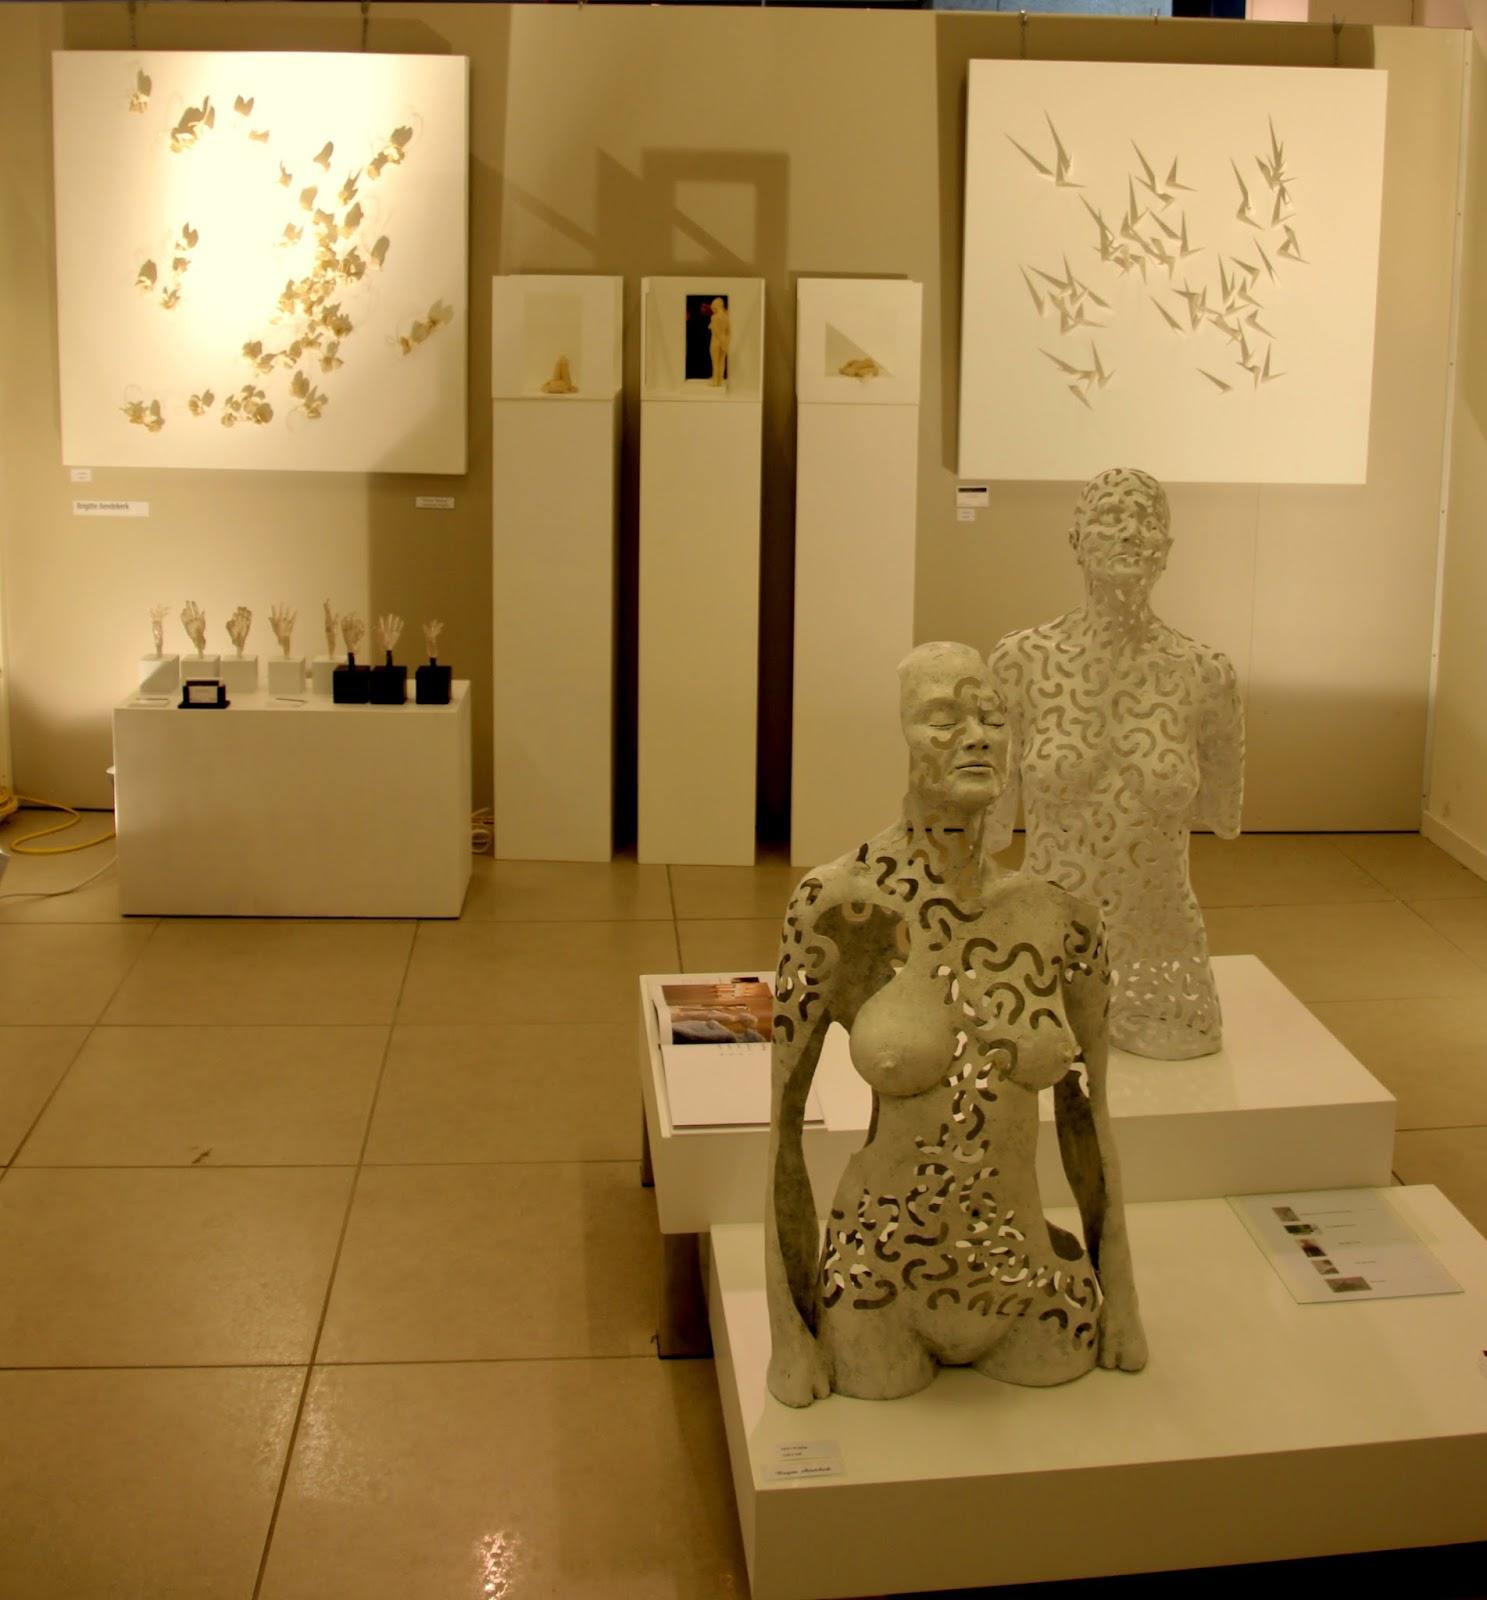 Global art vzw impressions exhibition december 2015 ga vzw julianus